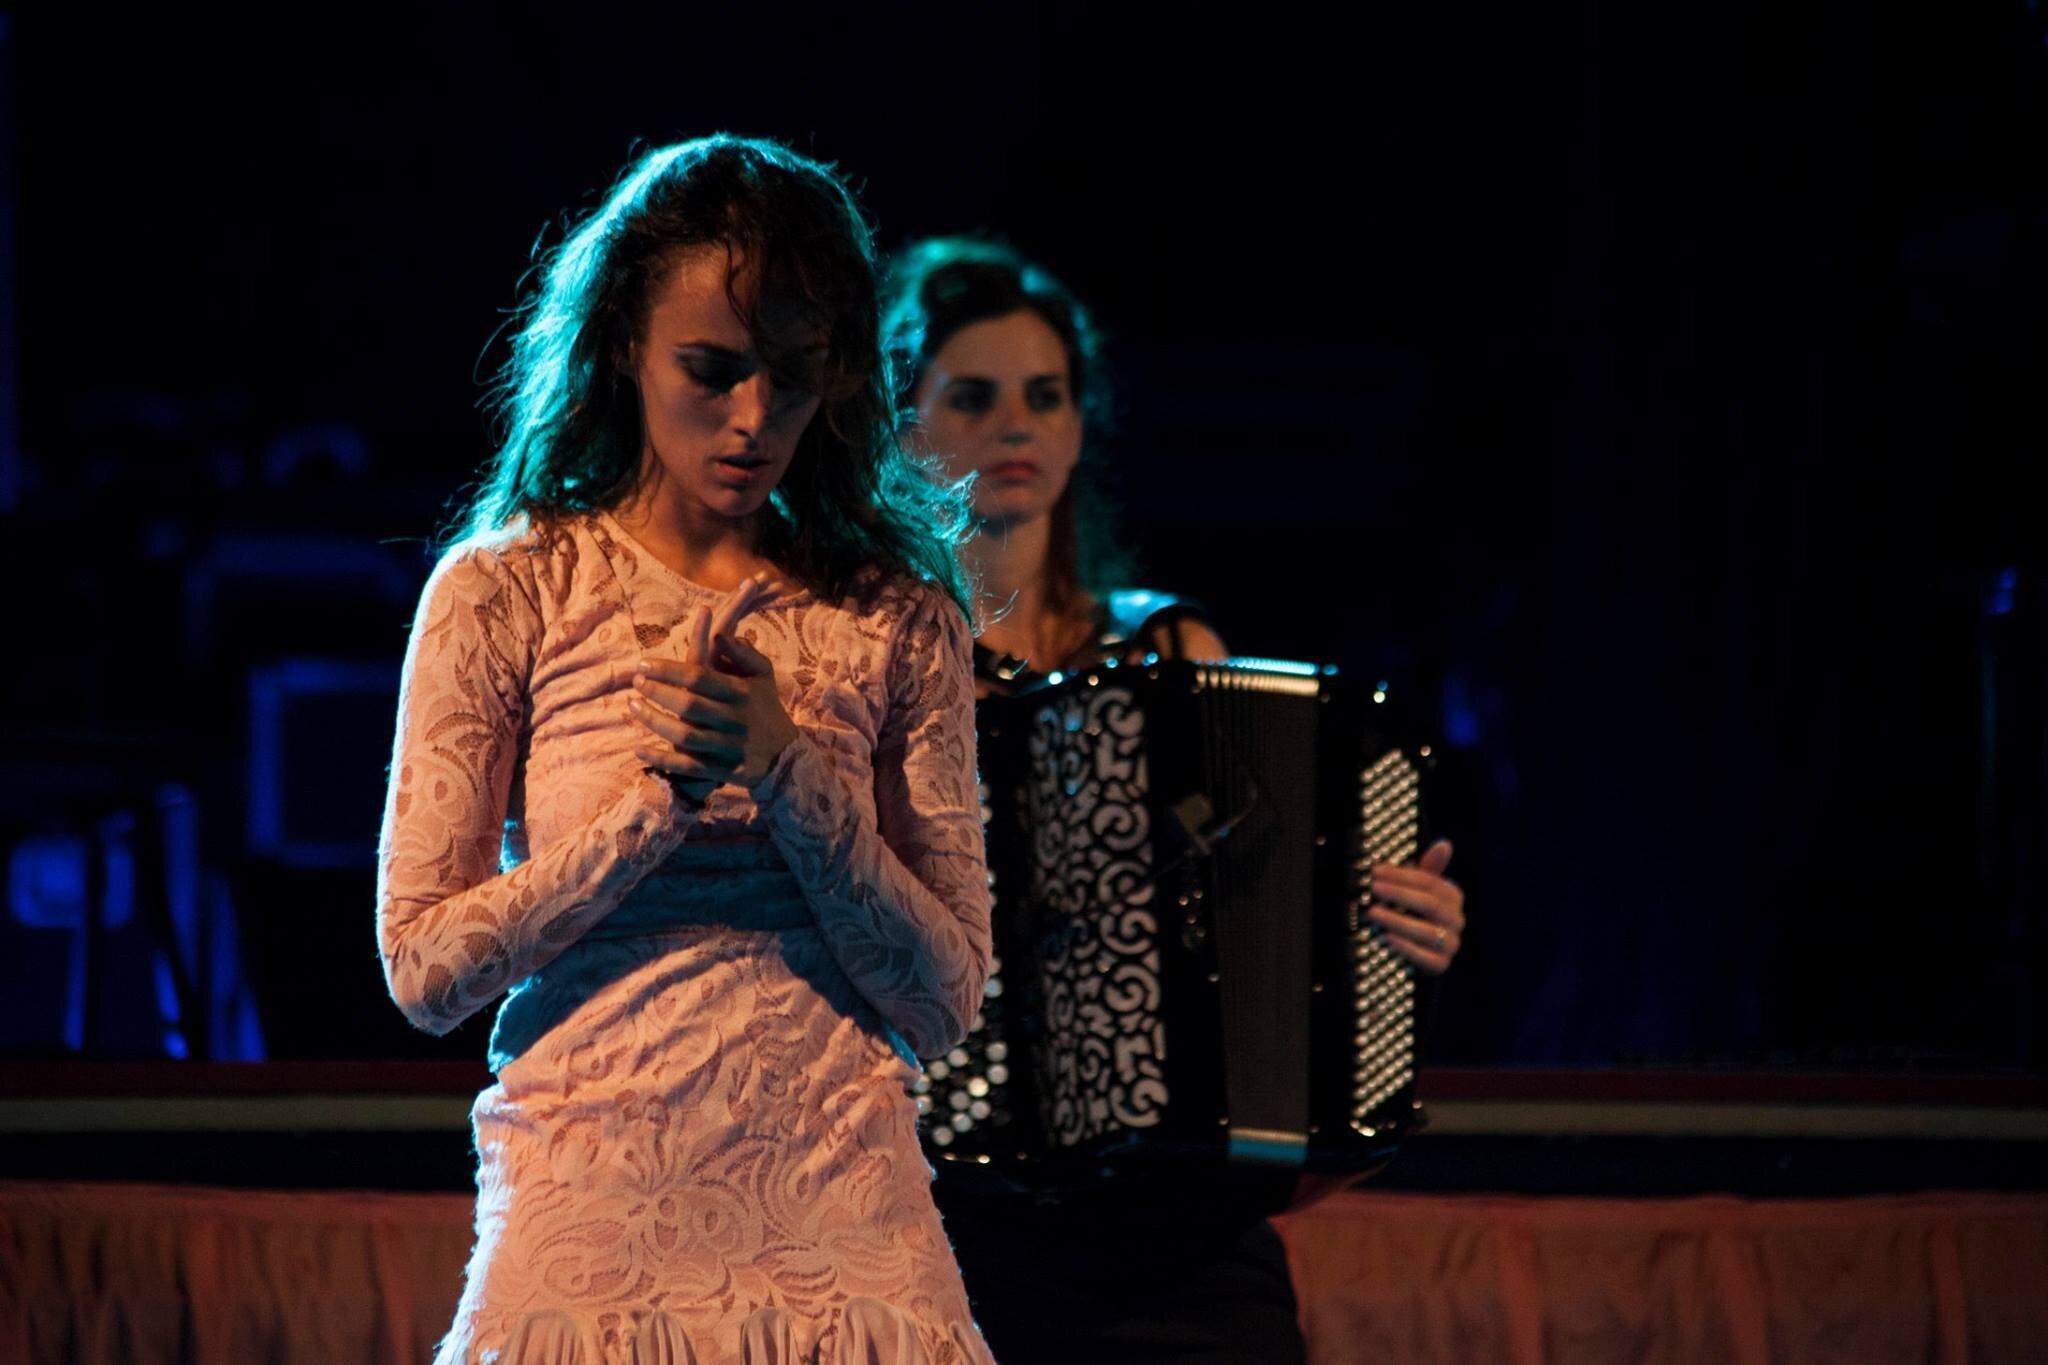 "Edén Club - Inés Boza & Giulia Valle ""Senza Tempo""Espectáculo de danza y músicaEstreno: Noviembre 2017, BarcelonaAcordeonista"